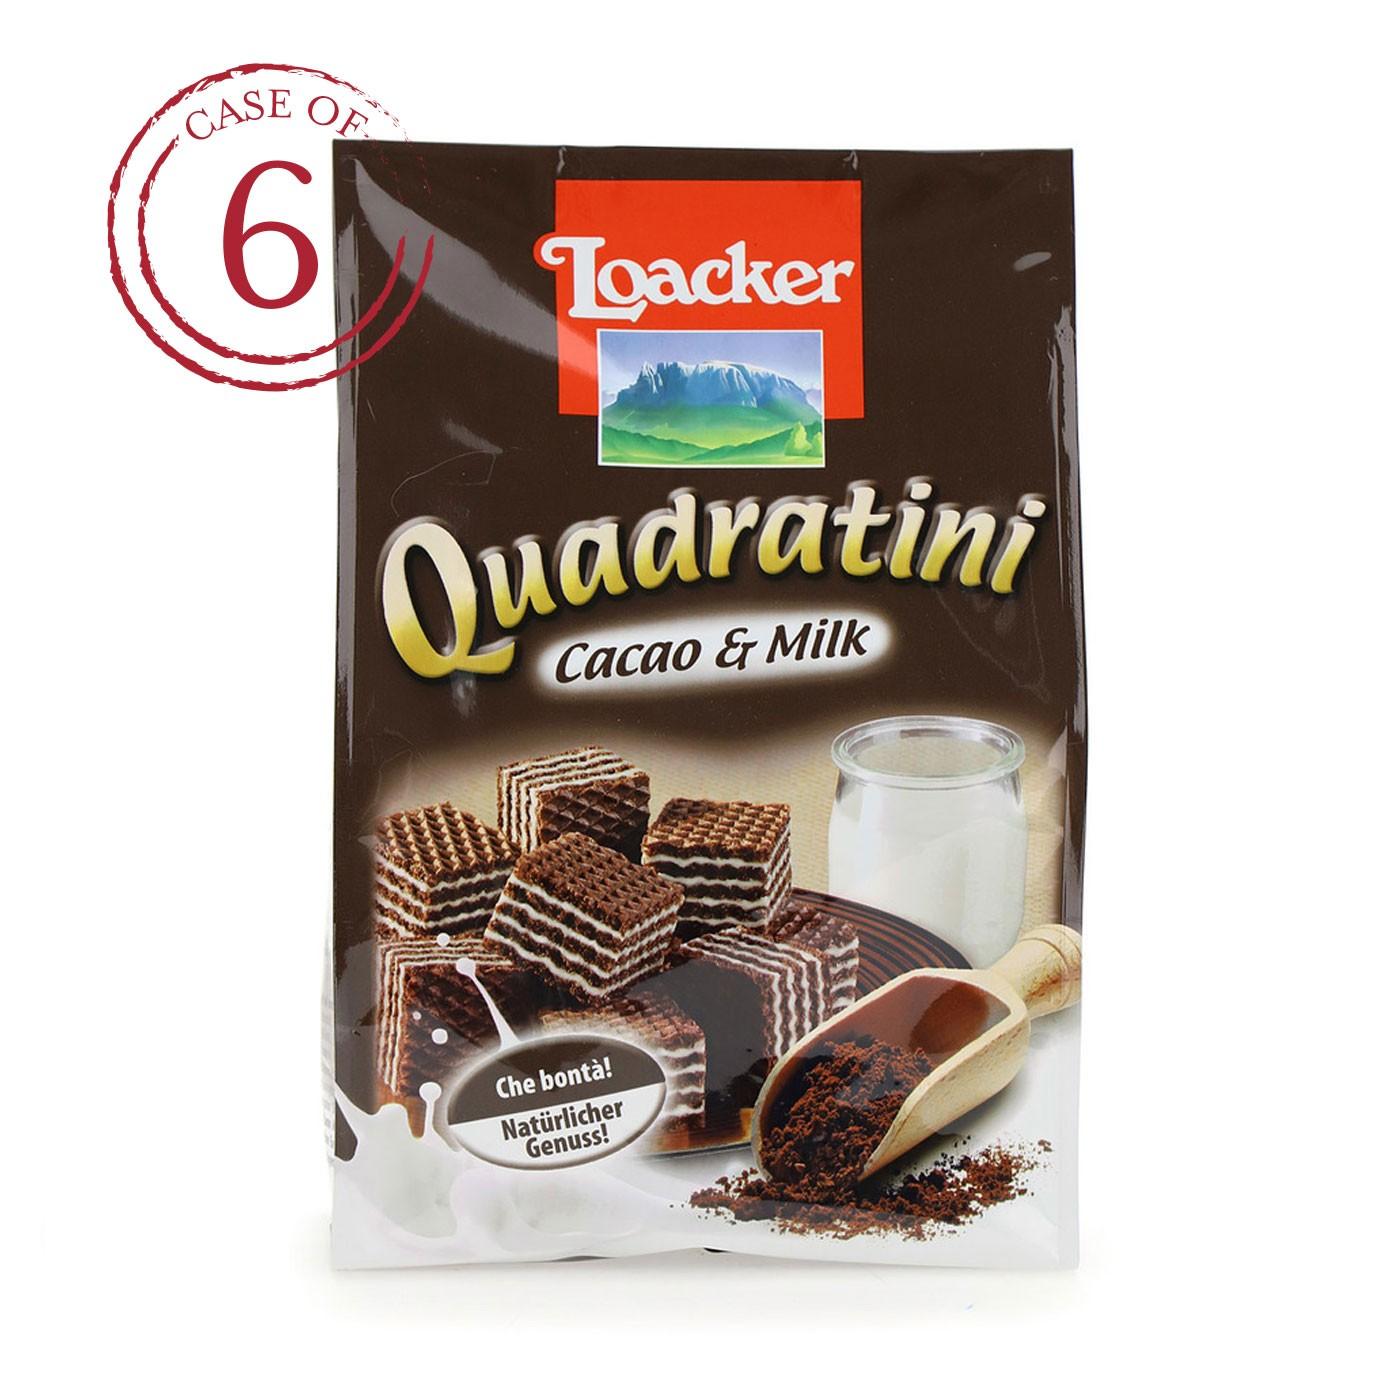 Cocoa-Milk Quadratini 8.8 oz - Case of 6